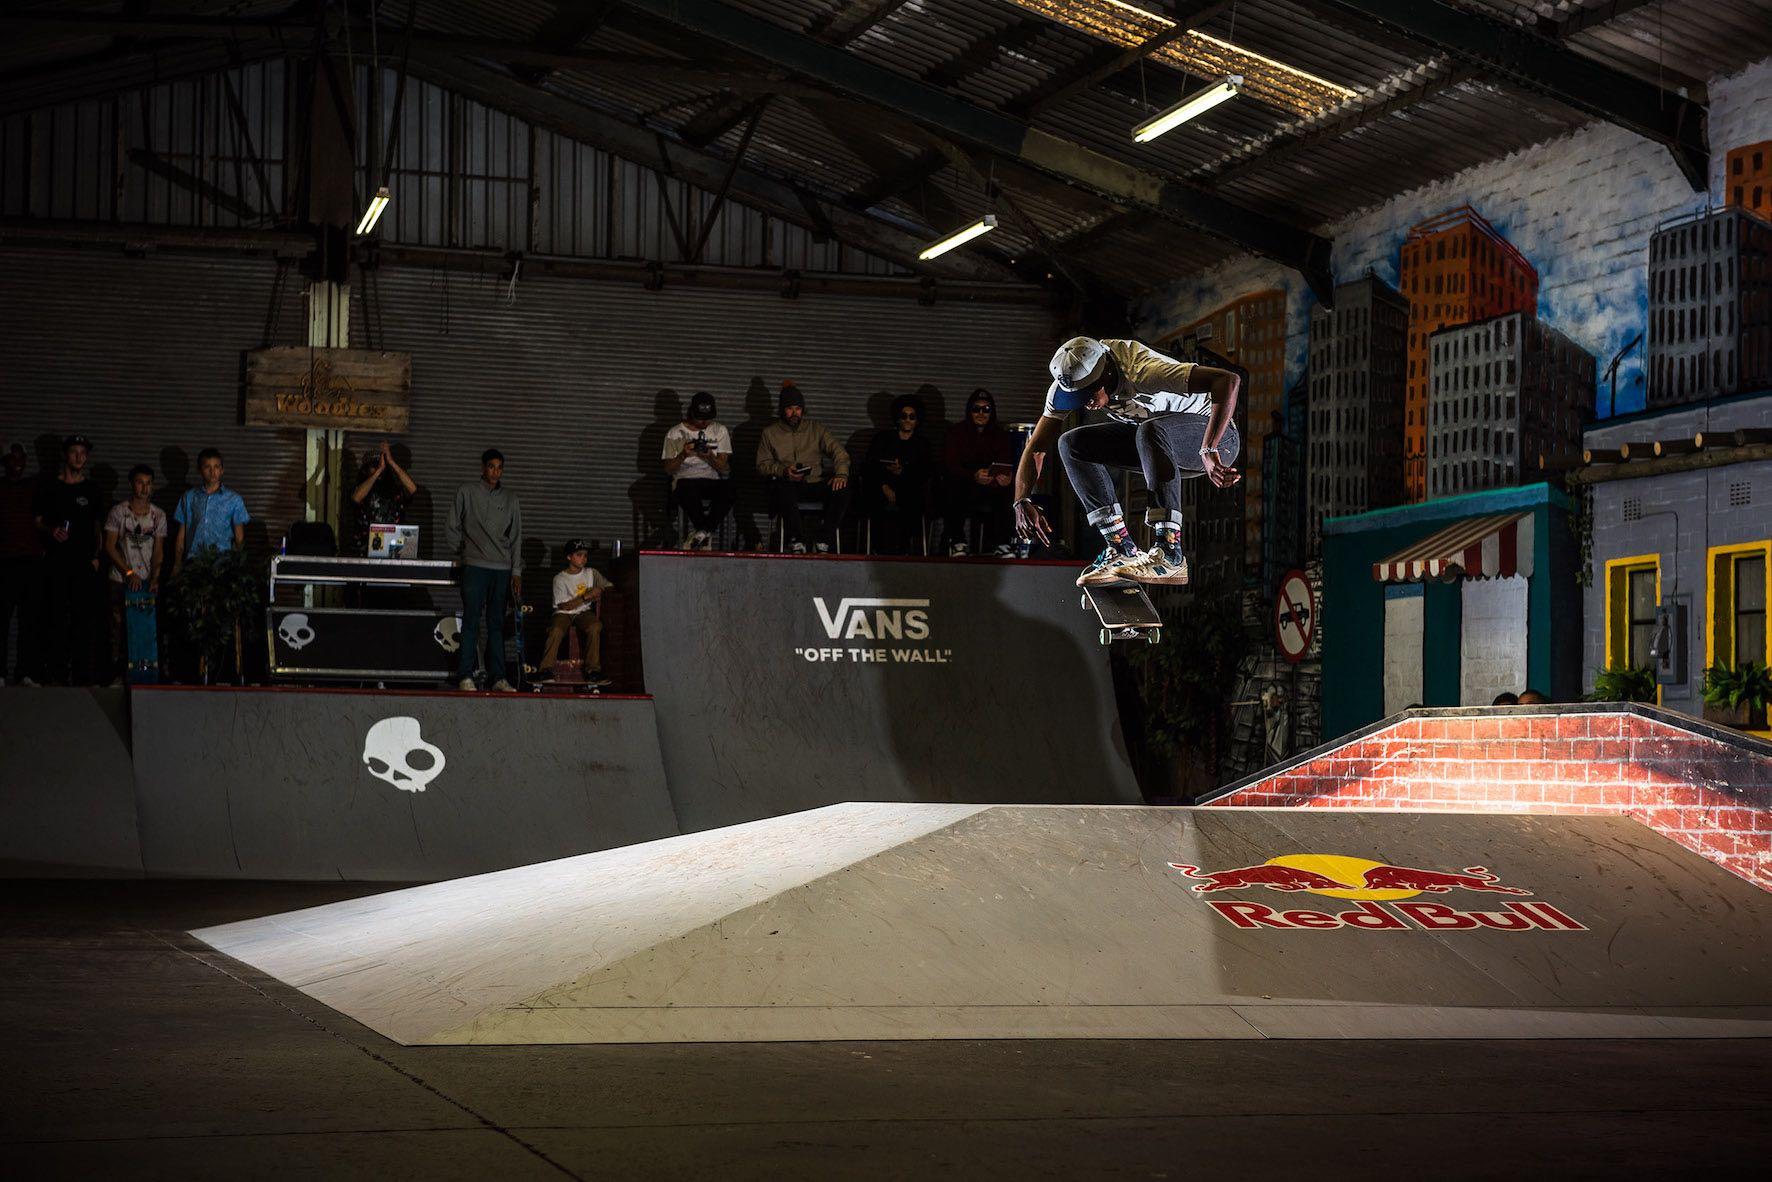 Thalente Biyela taking 3rd at the Winter Jam skateboarding contest